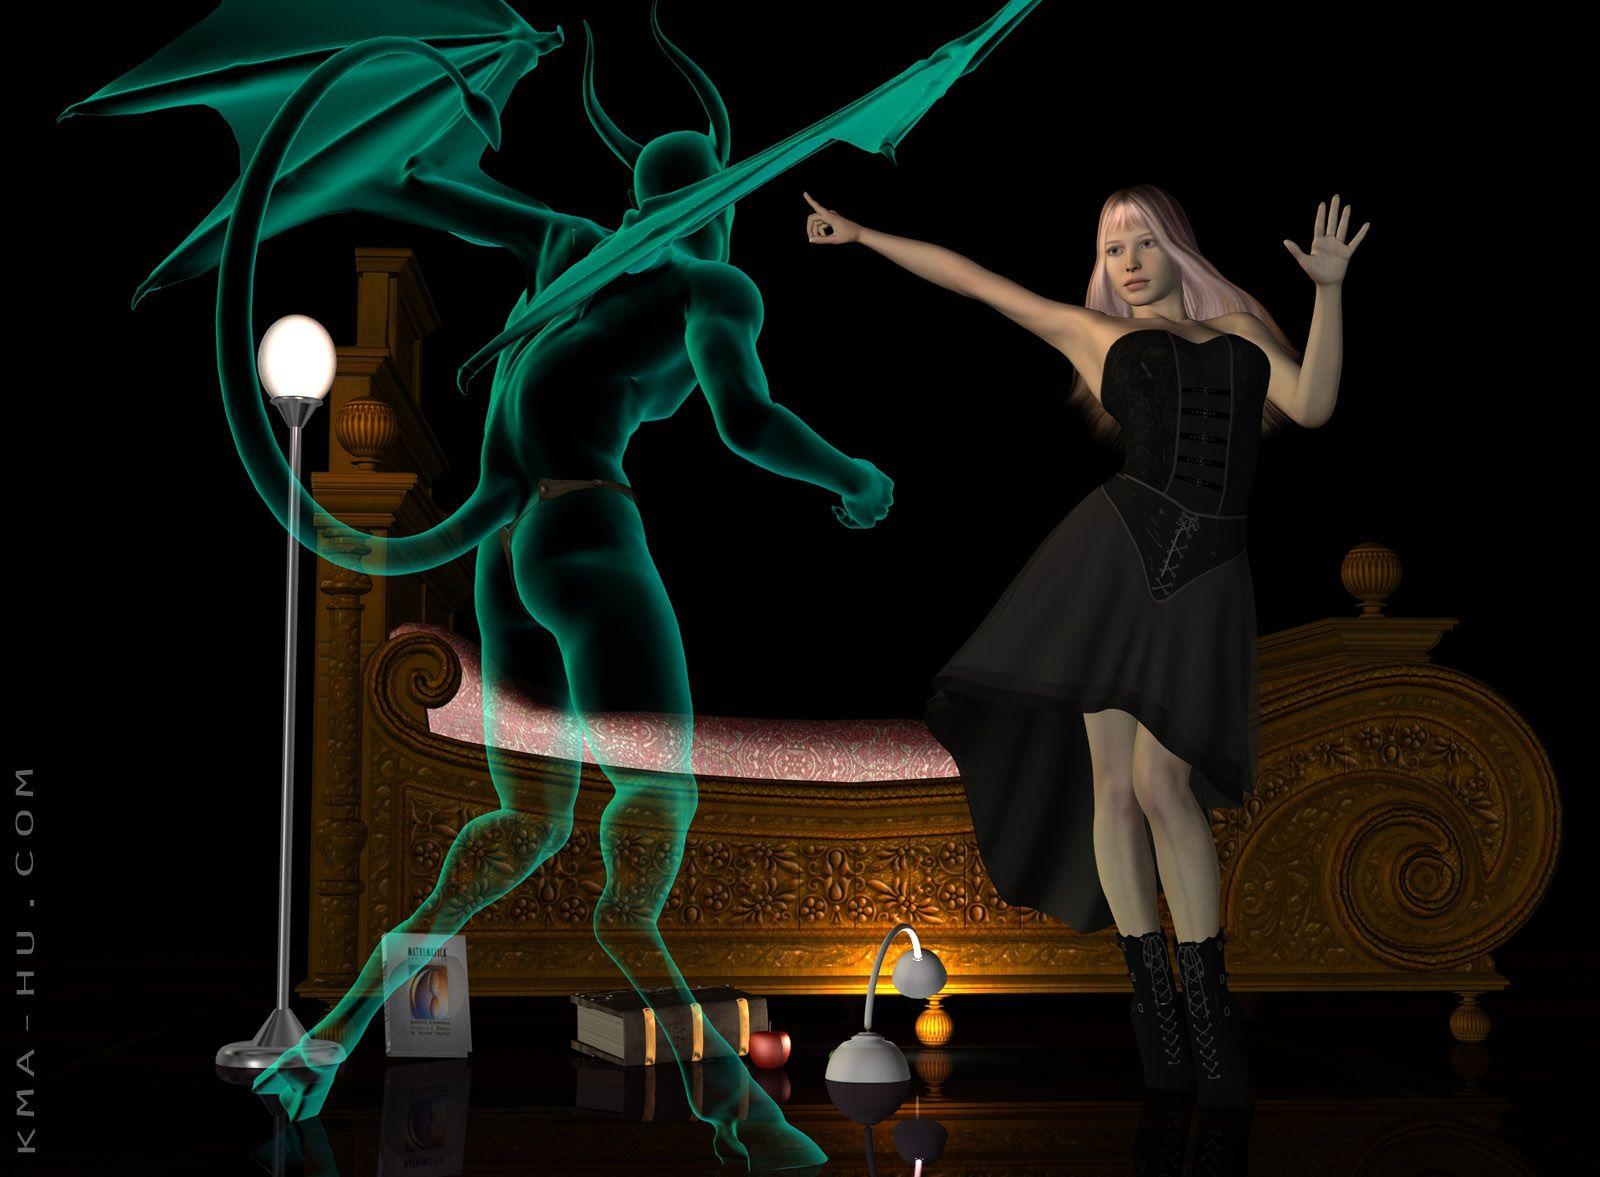 Lorian resist devil. http://kma-hu.com/3ds/